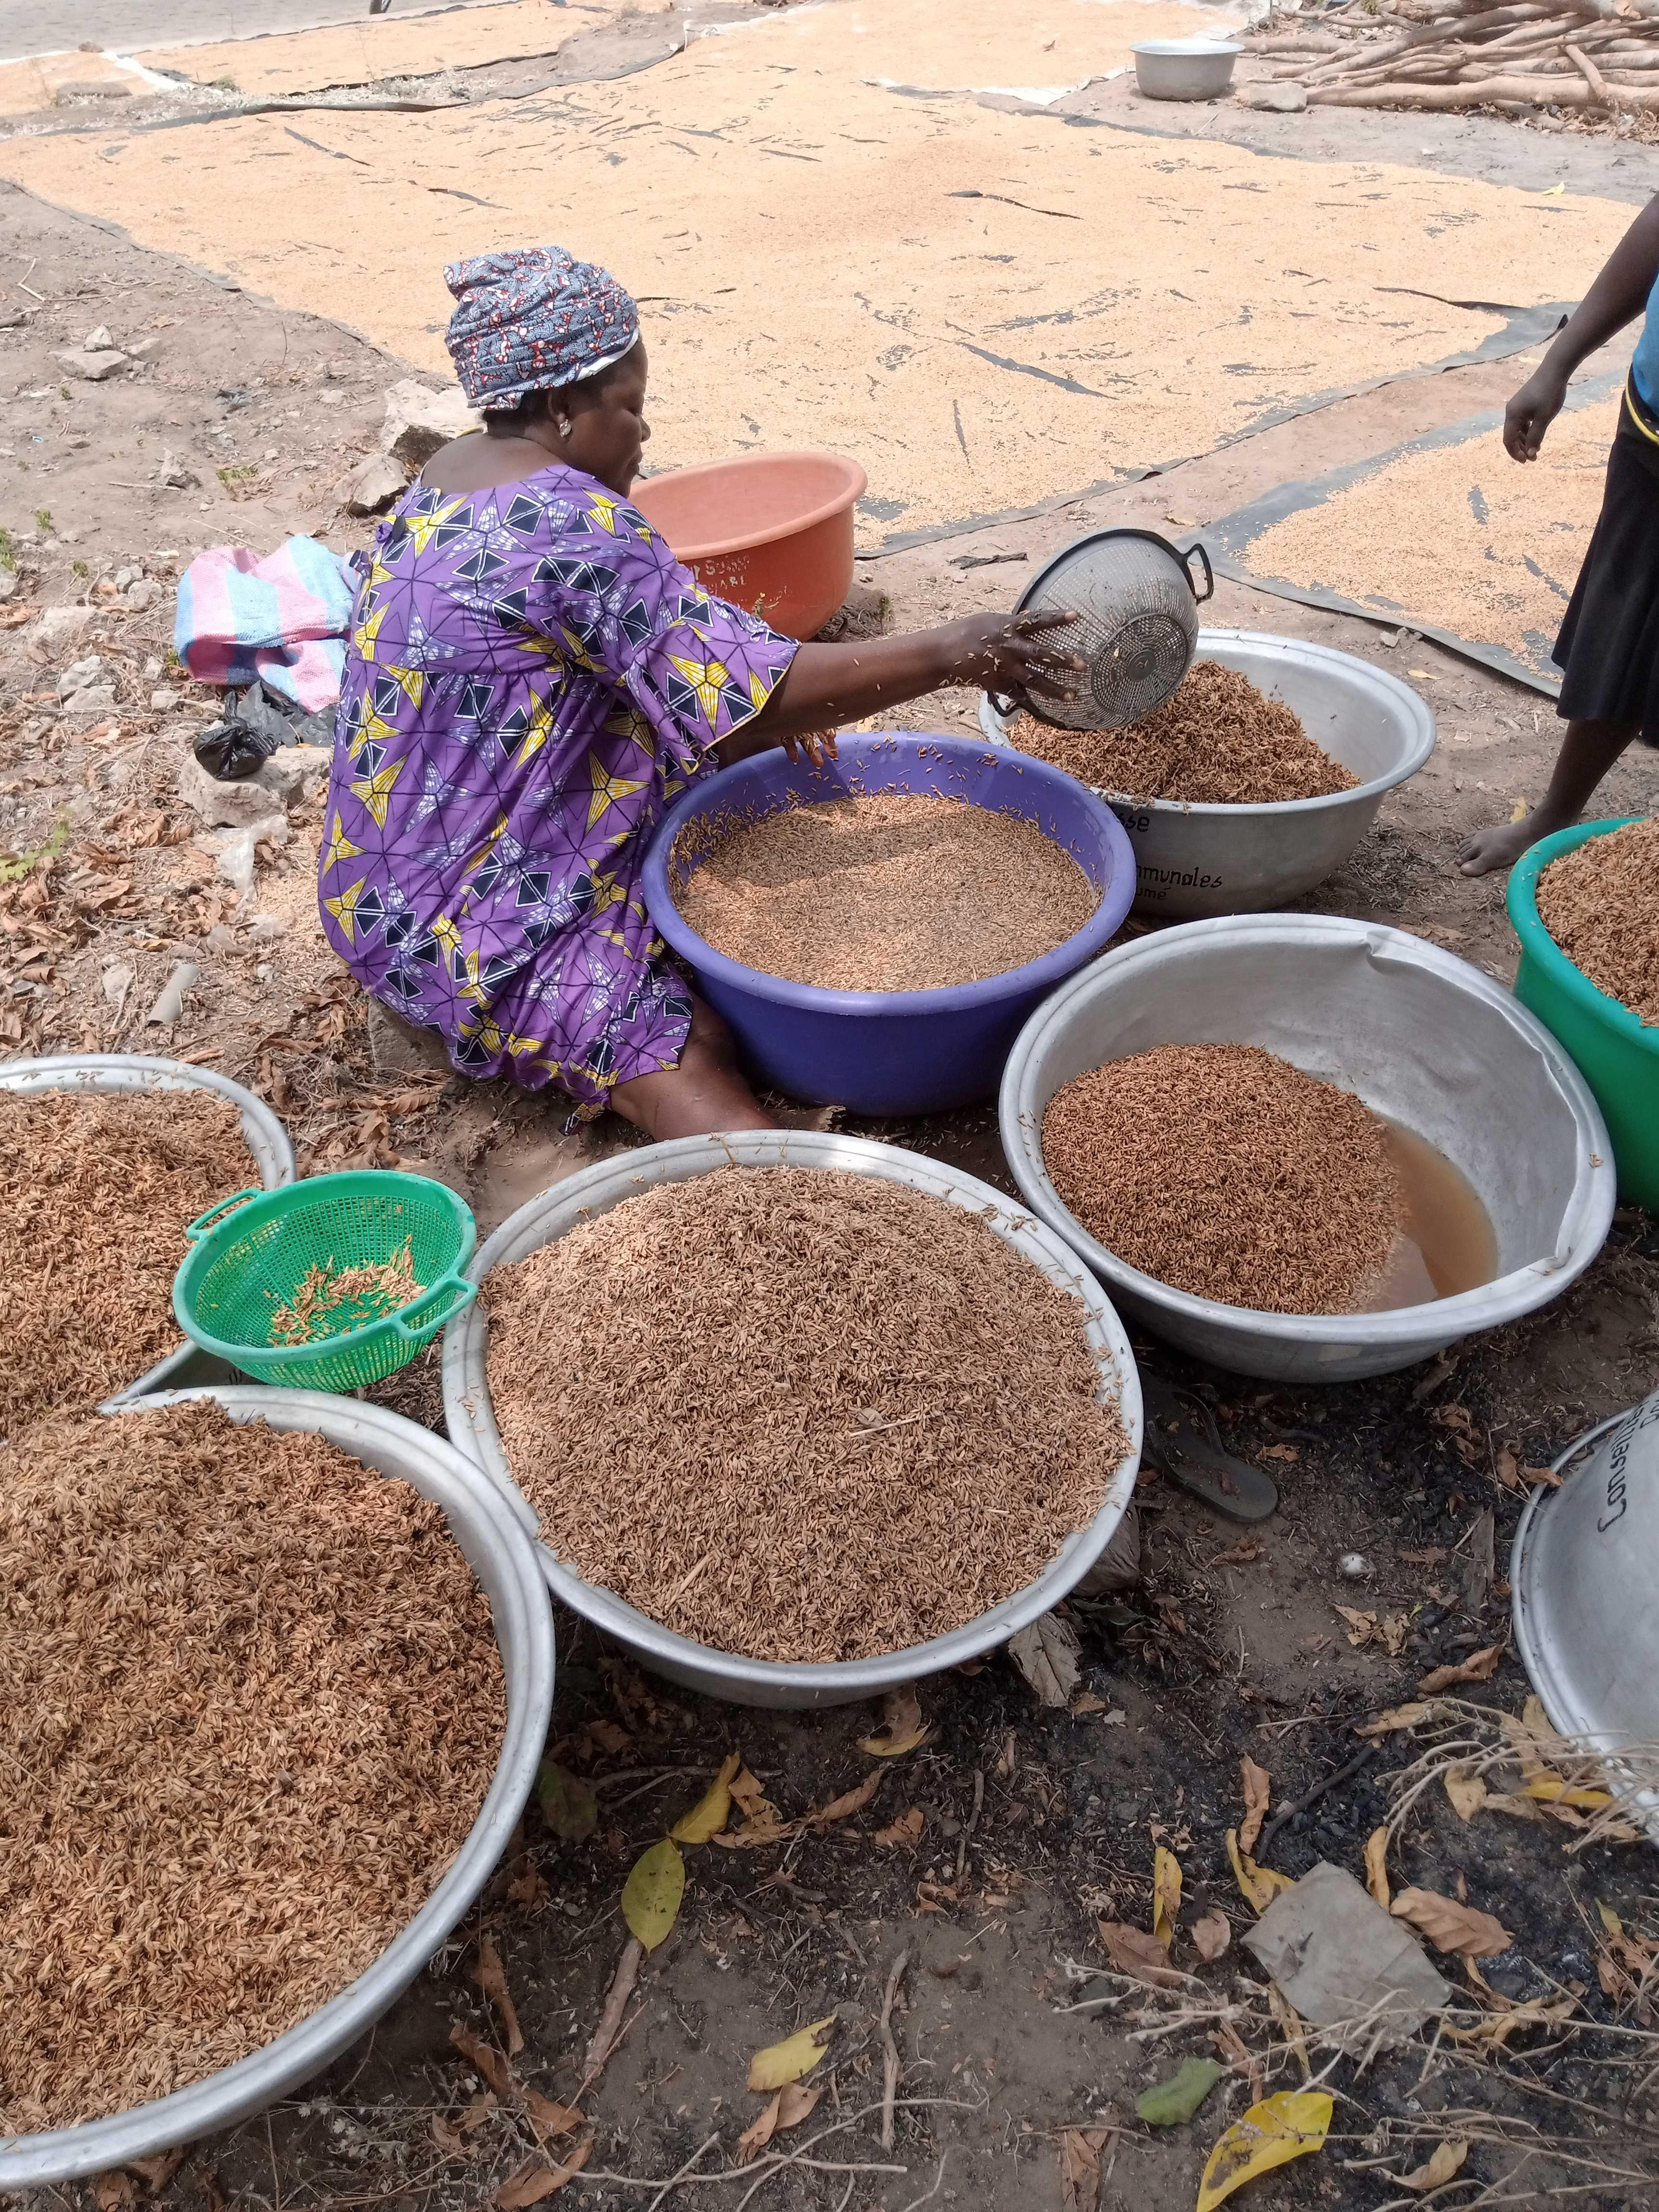 L'étuvage du riz paddy